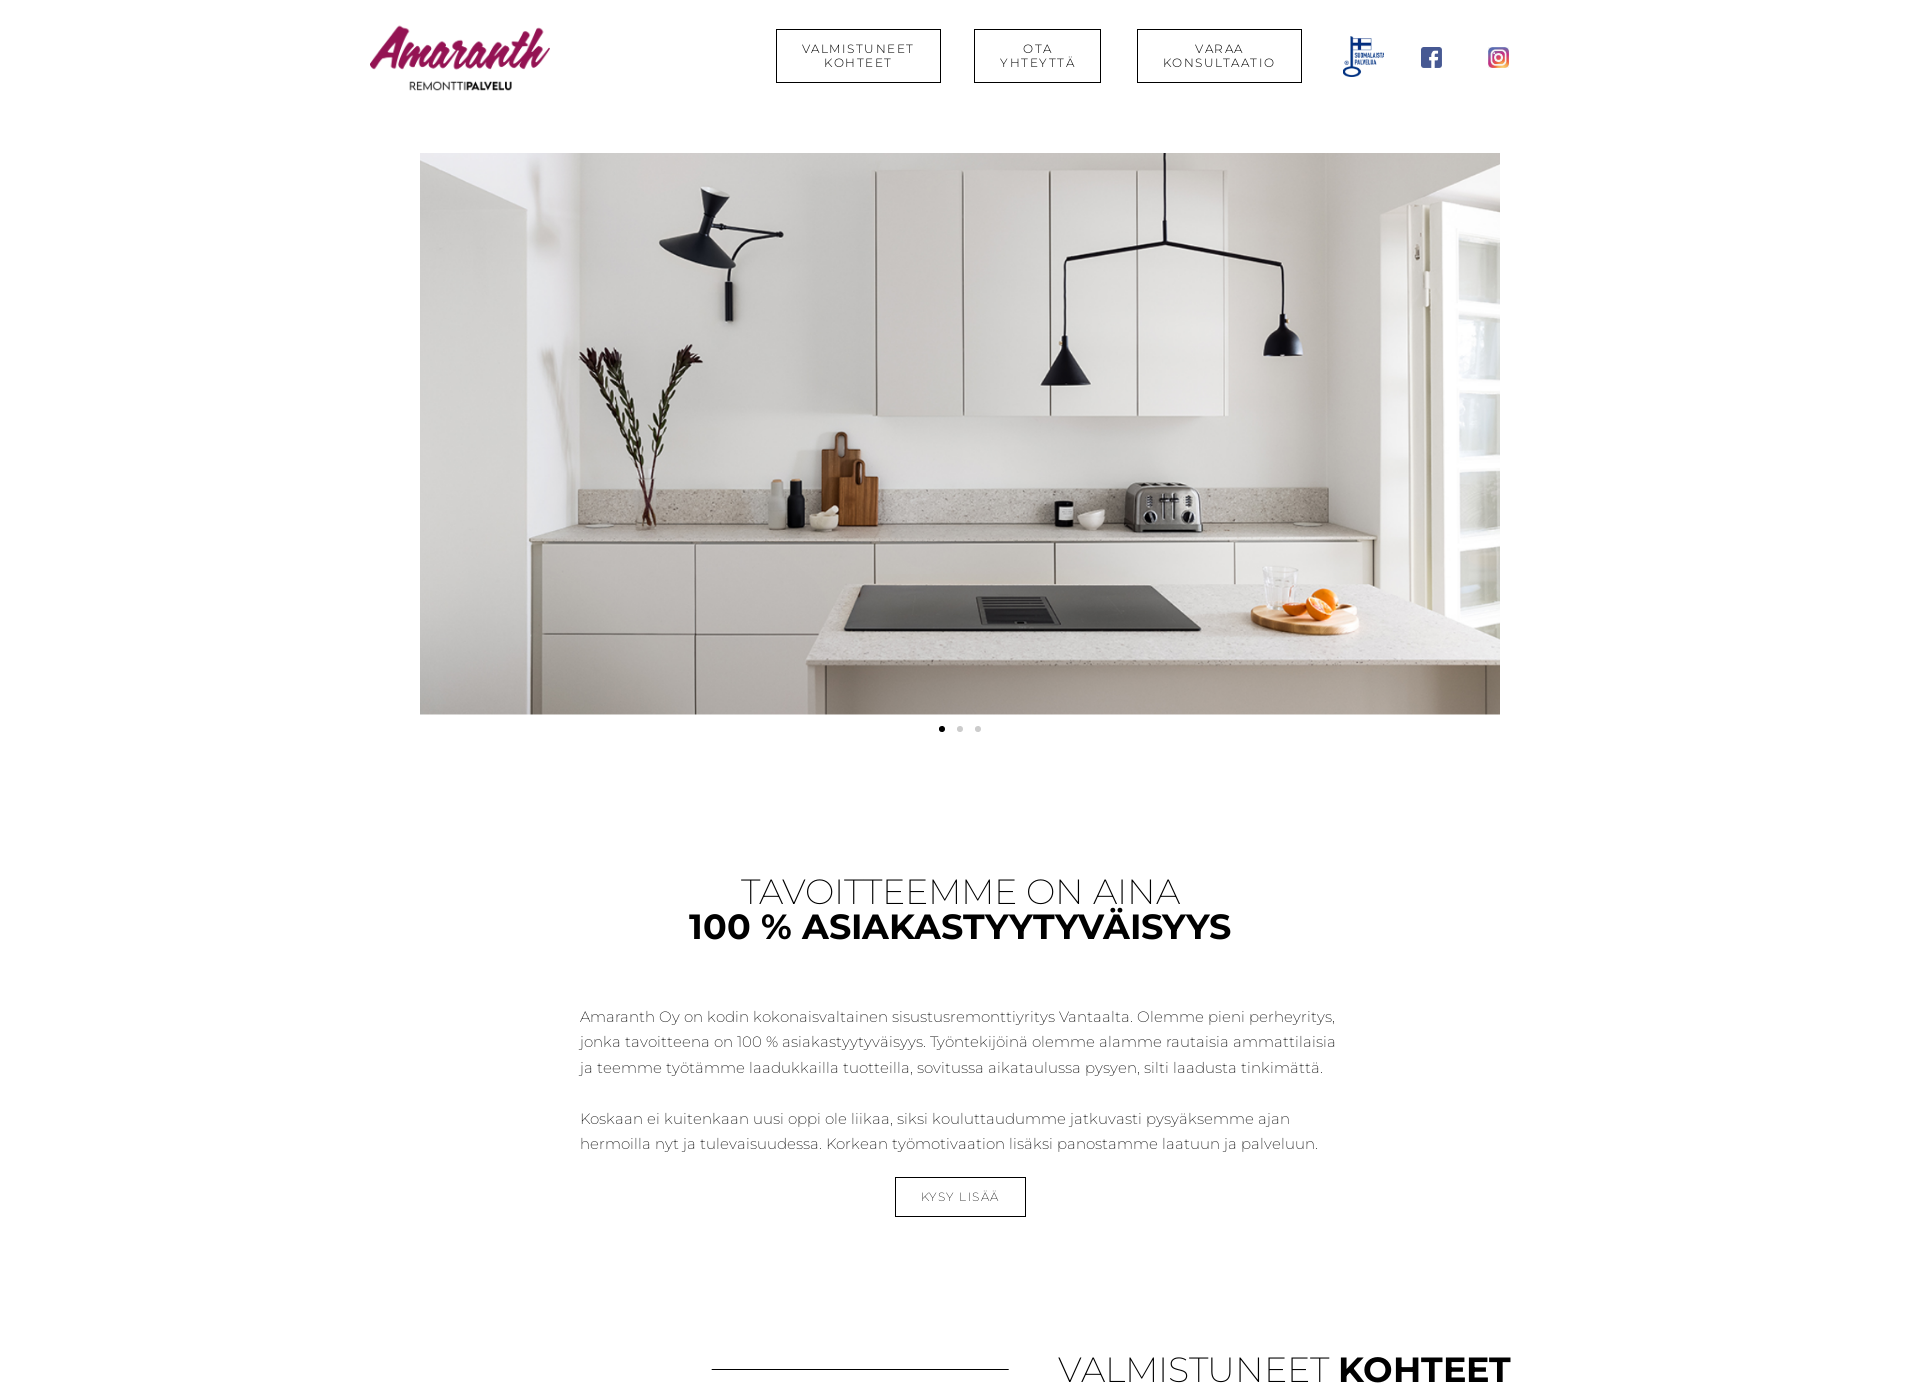 Screenshot for remonttipalveluamaranth.fi